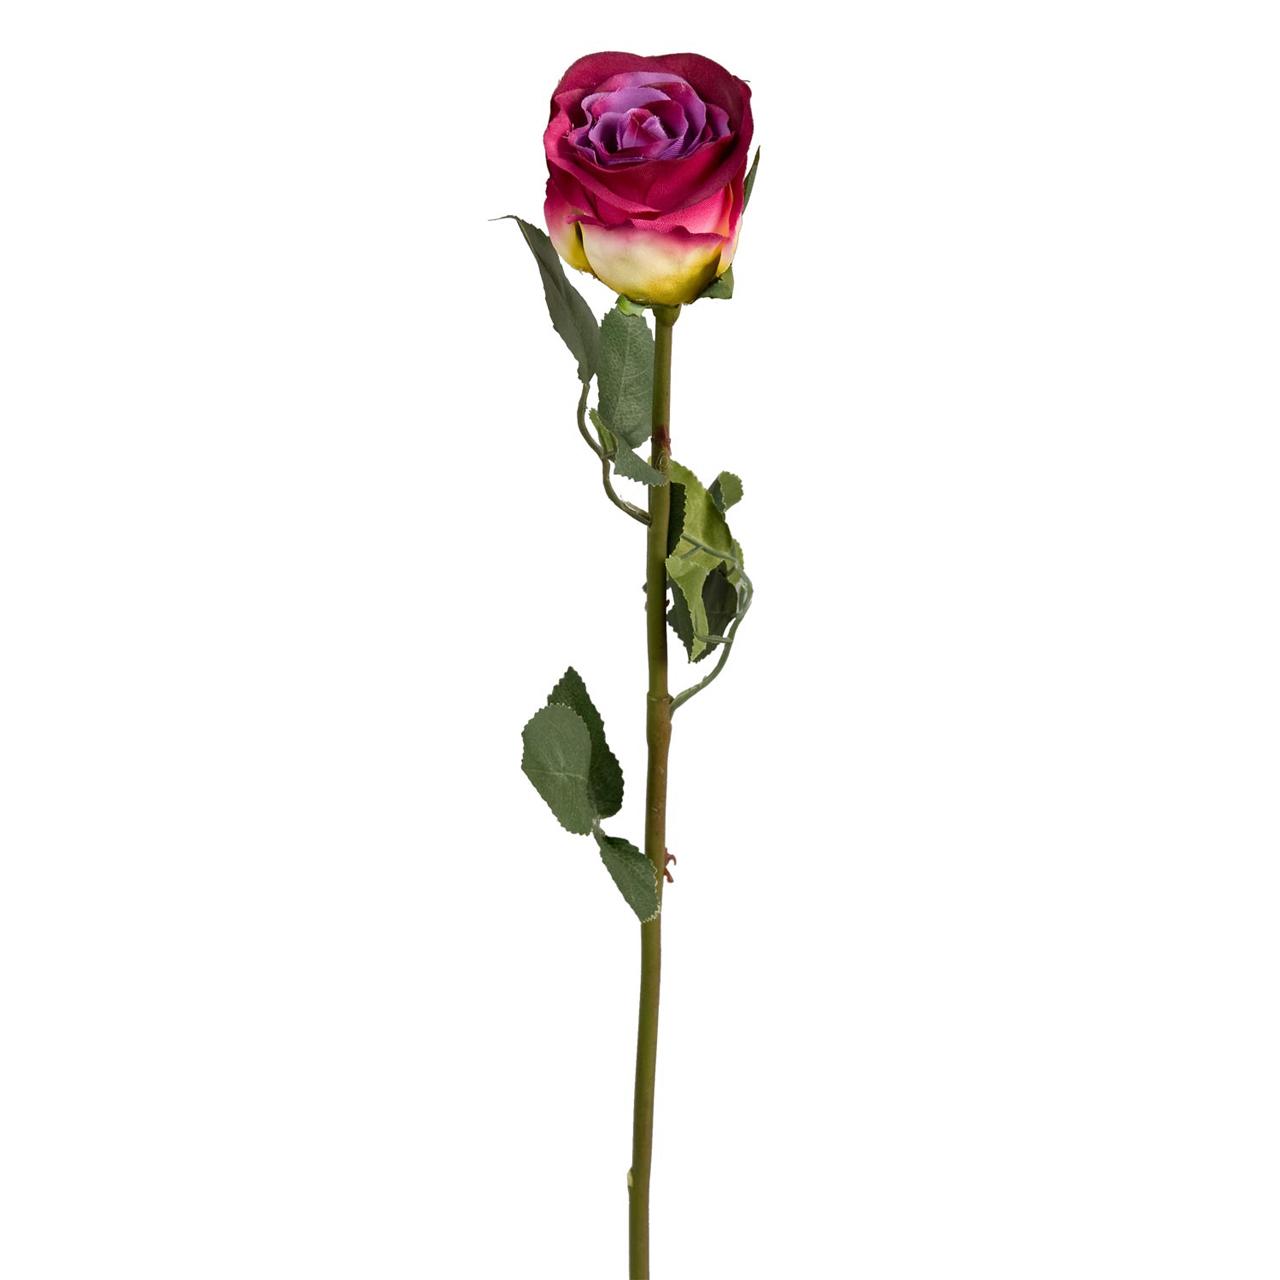 Floare Artificiala Trandafir Visiniu 60 Cm